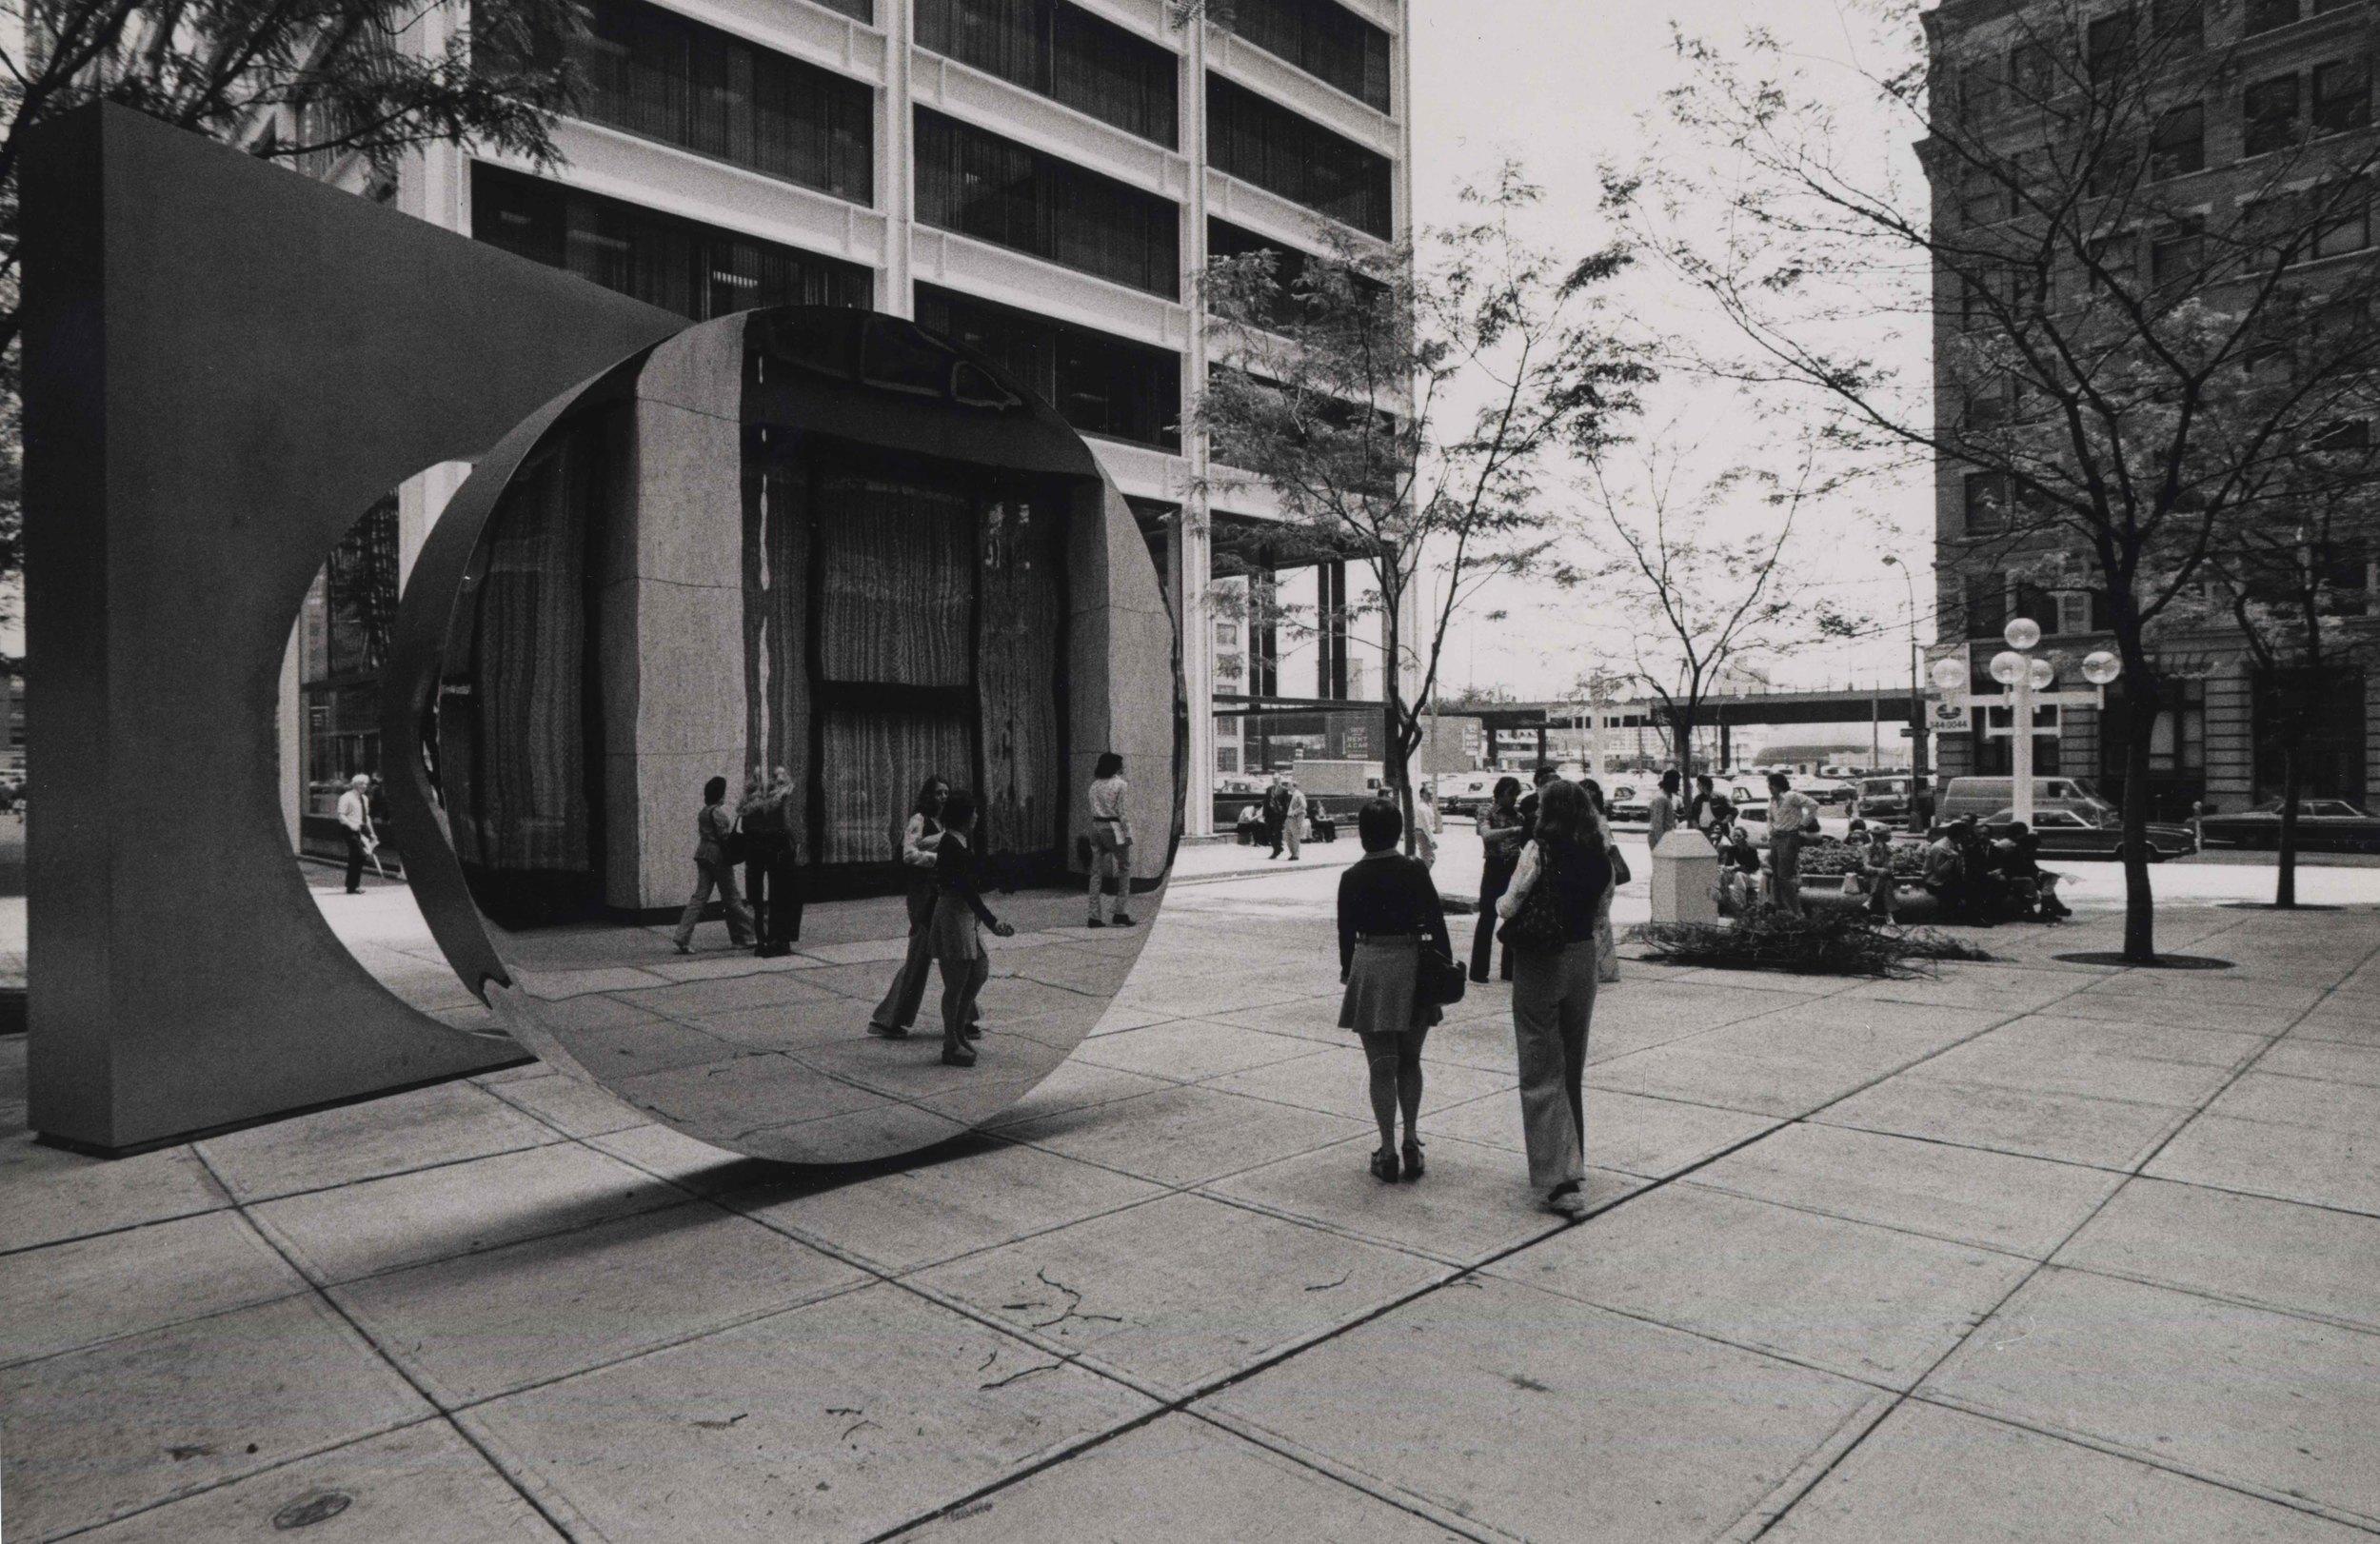 15_91_Reflective sculpture on the street_Dan Wynn Archive.jpeg